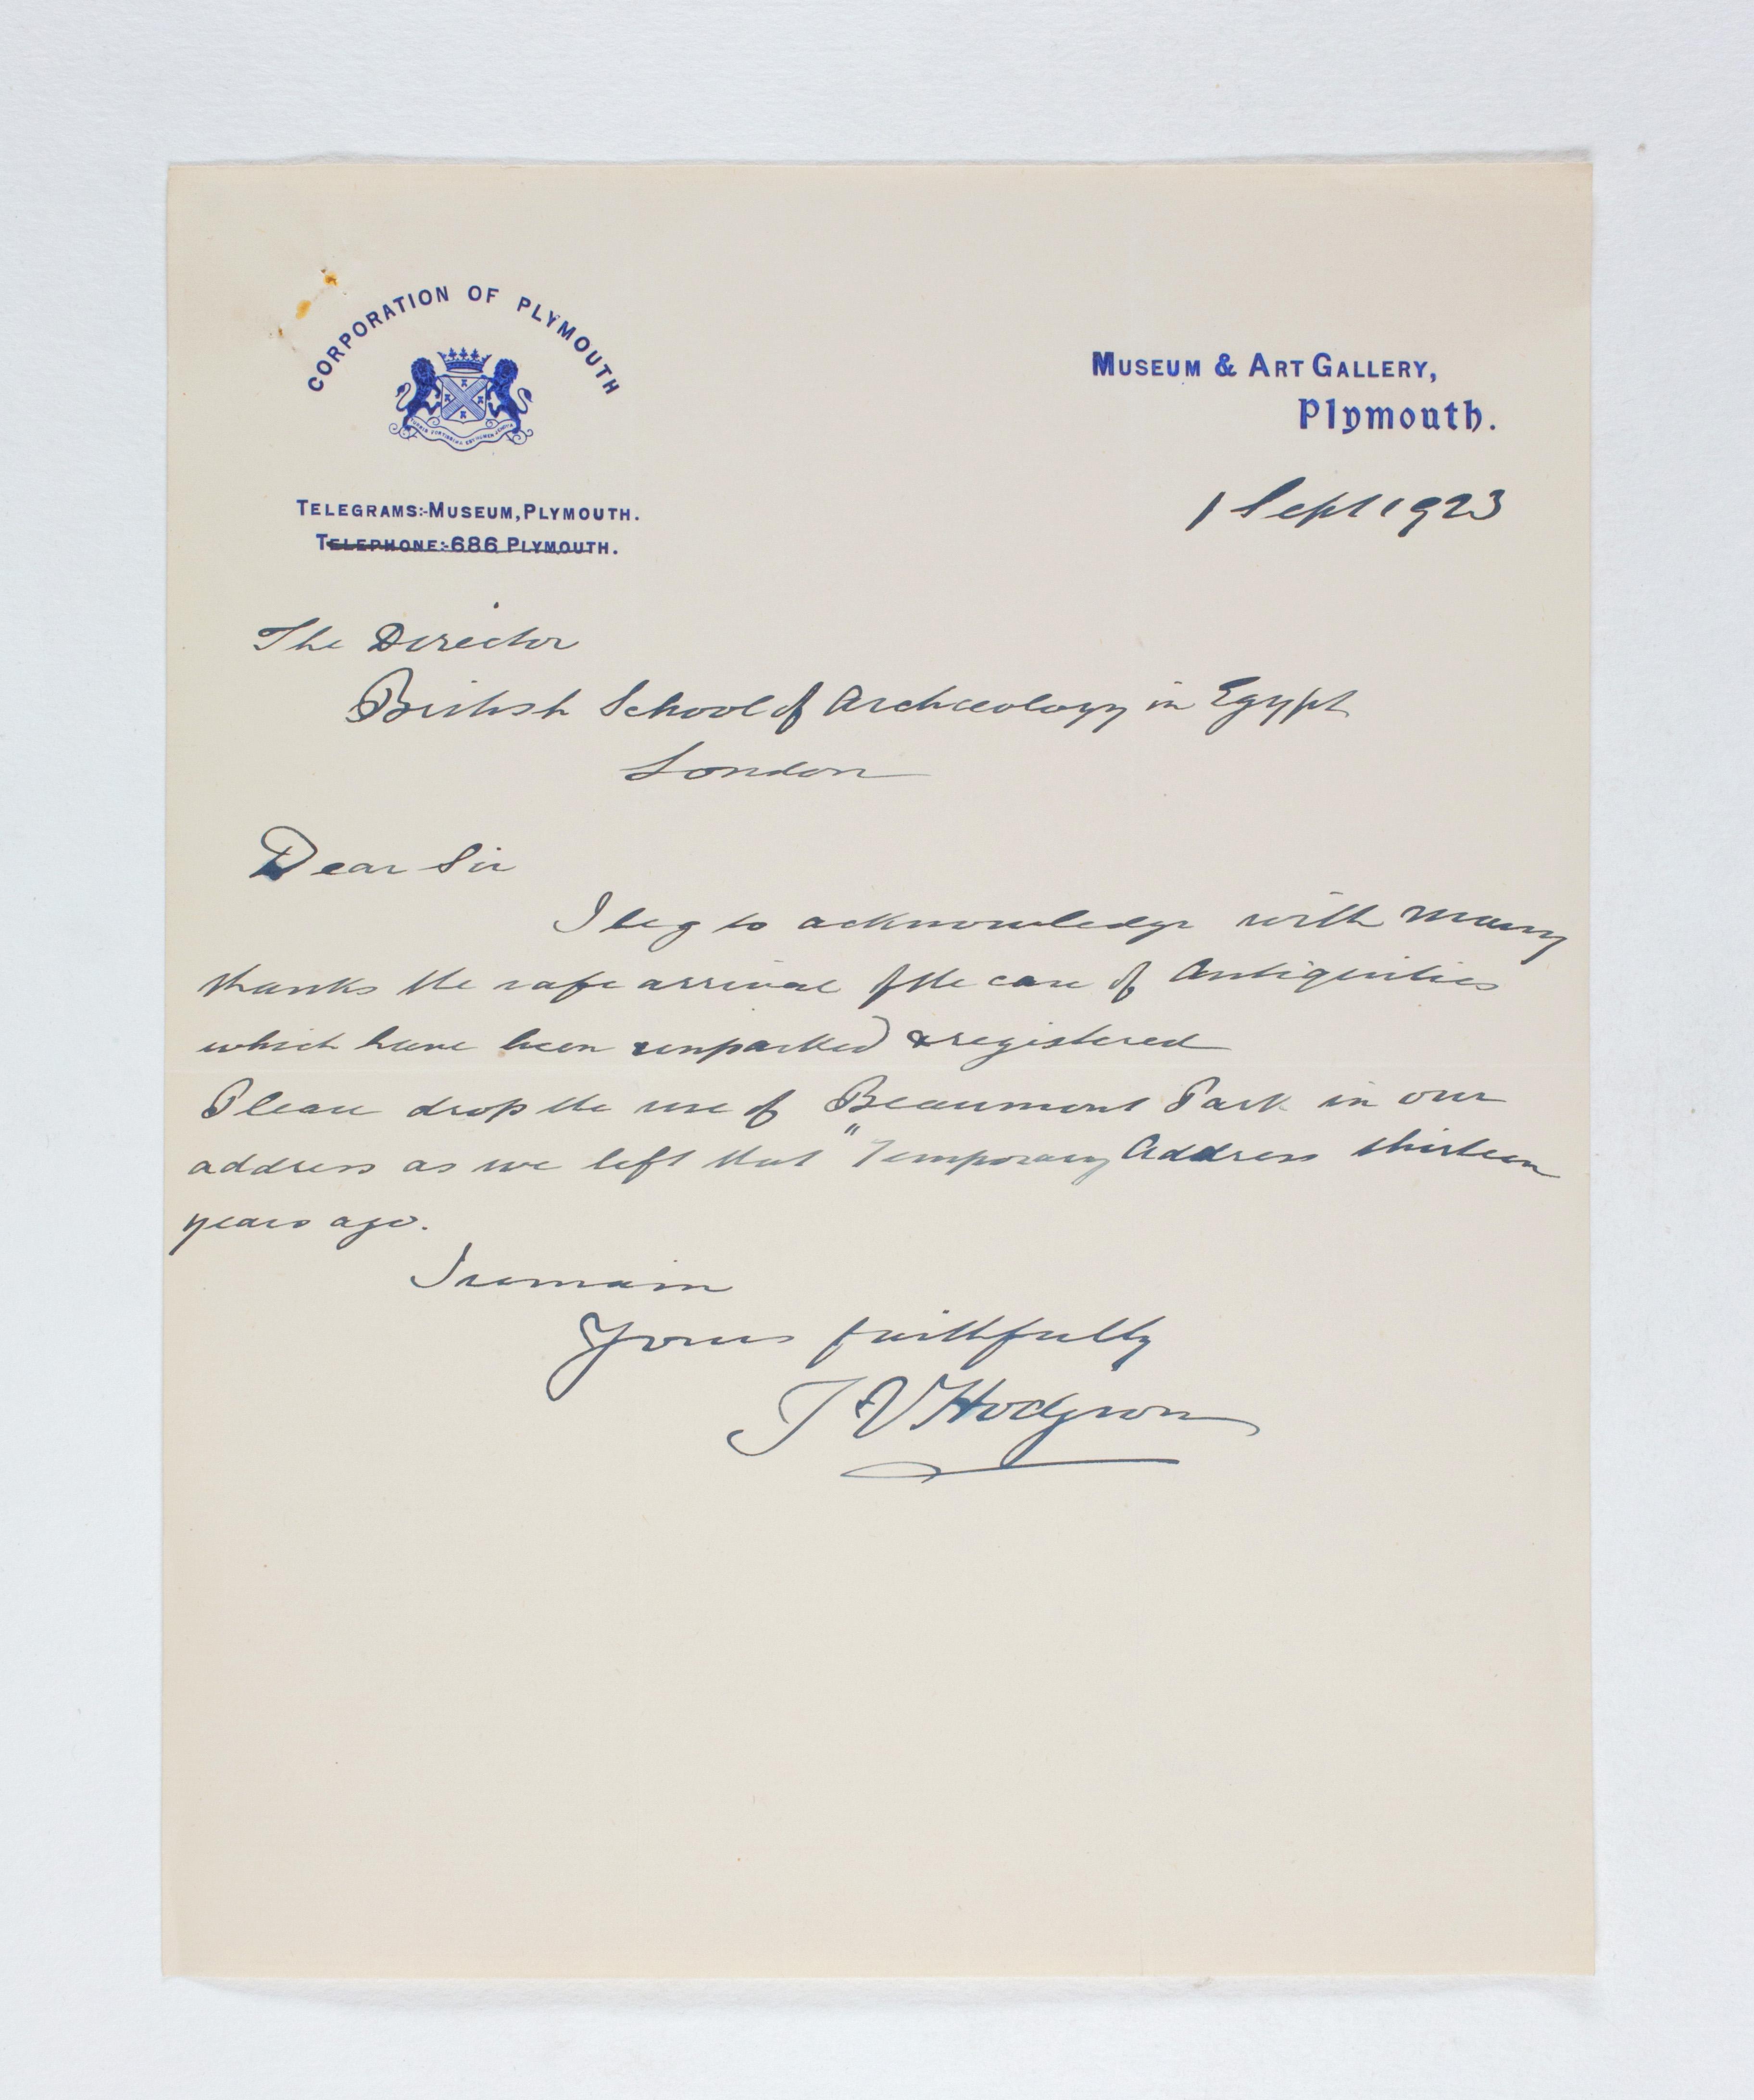 1922-23 Qau el-Kebir Correspondence PMA/WFP1/D/26/40